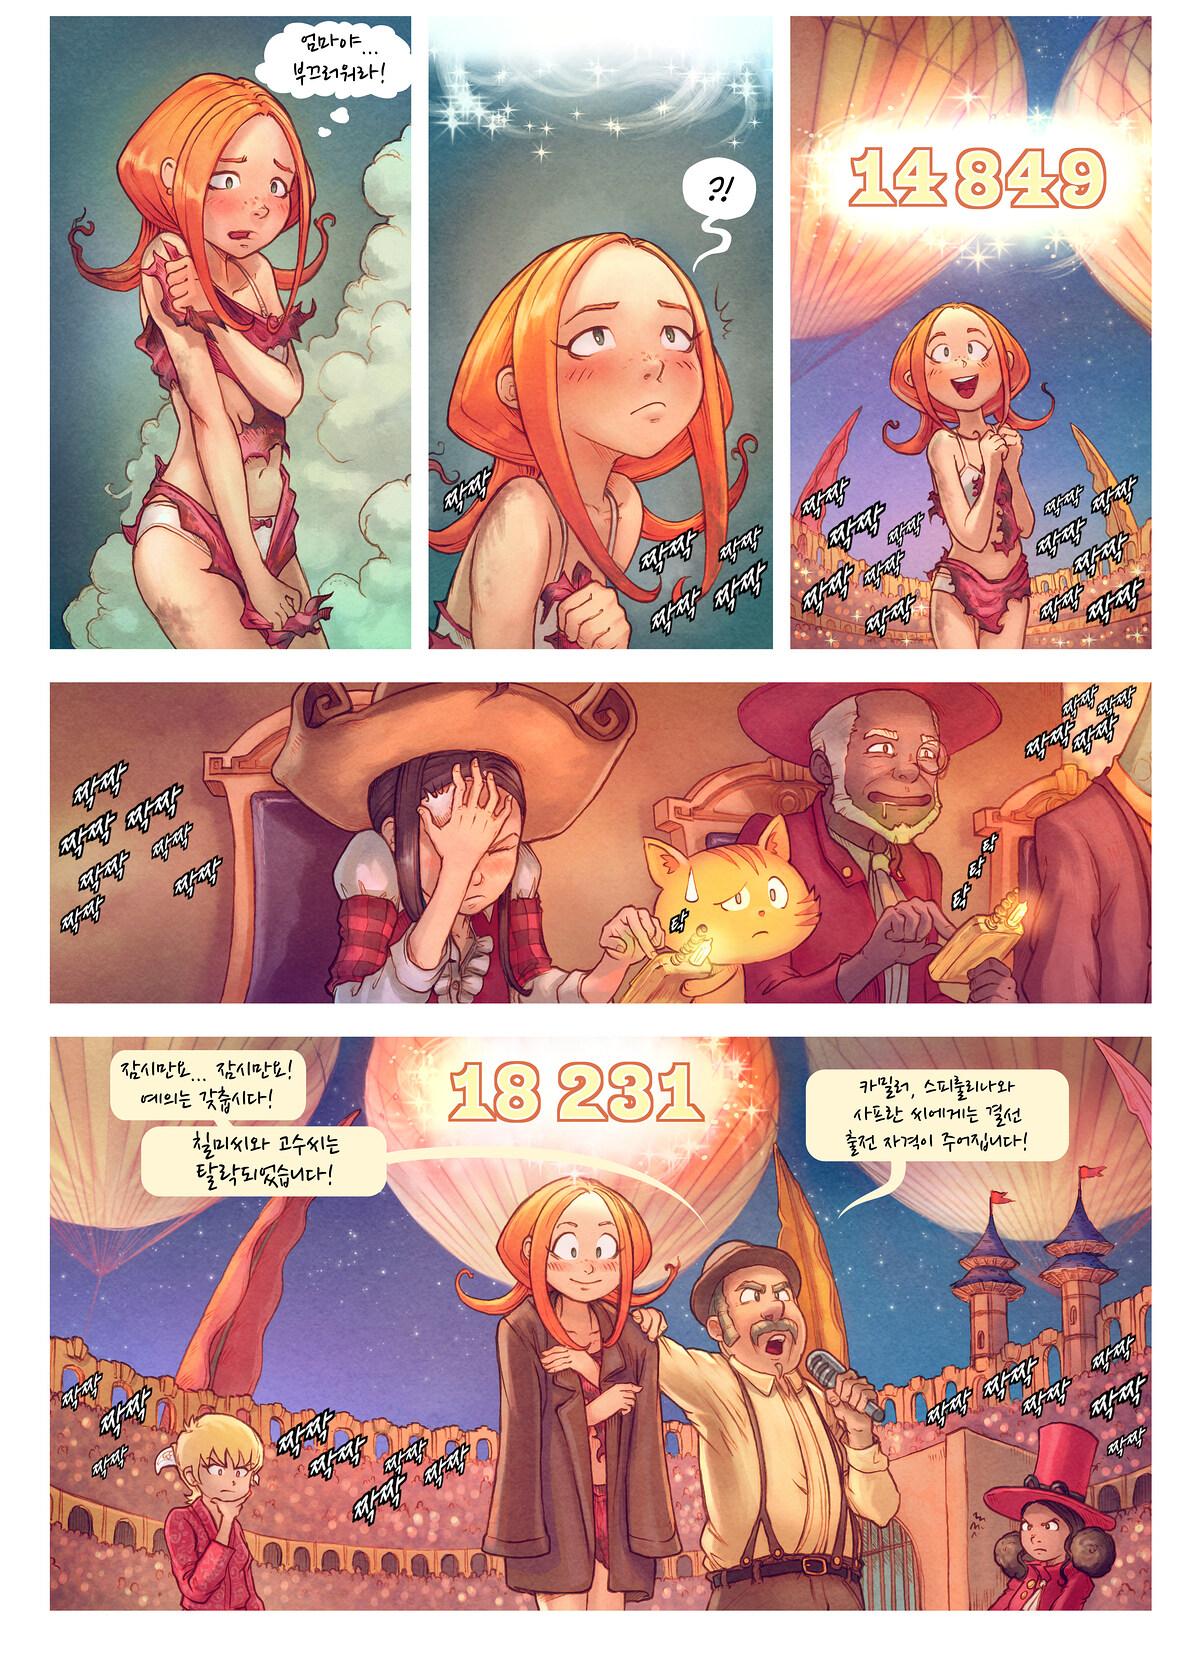 A webcomic page of Pepper&Carrot, 에피소드 22 [kr], 페이지 9